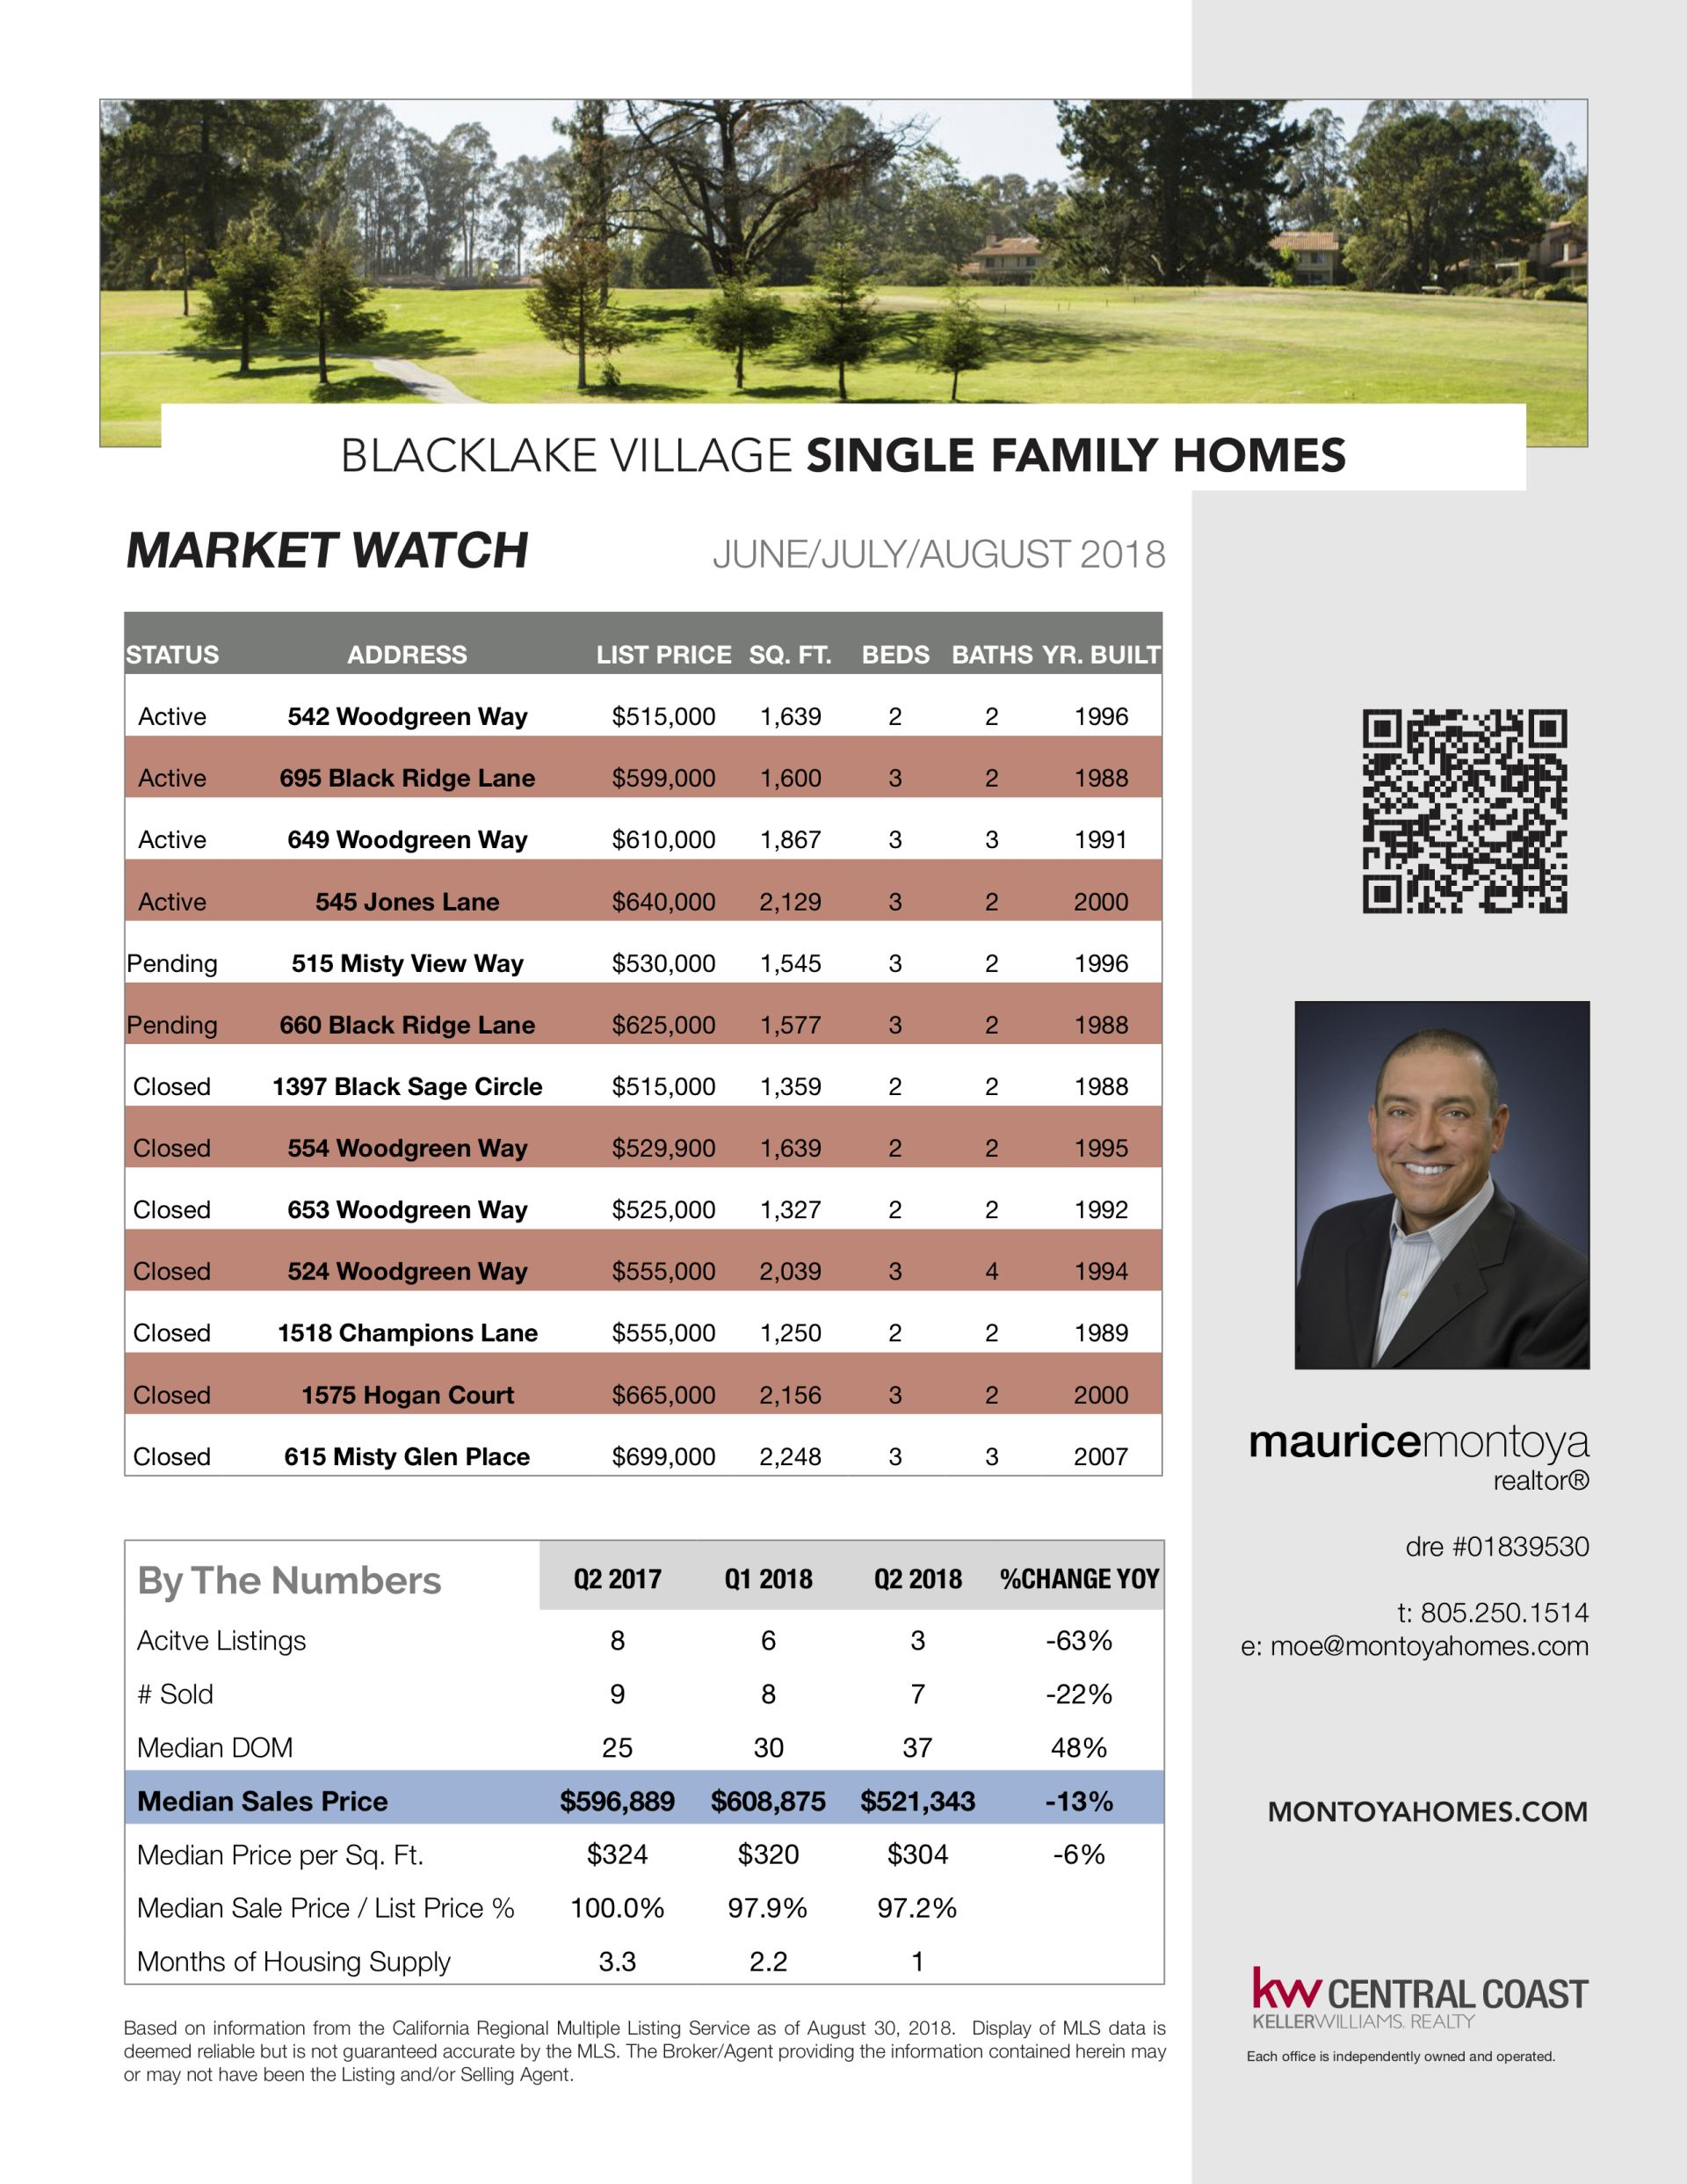 Blacklake Village Market Watch – Jun-Aug. 2018